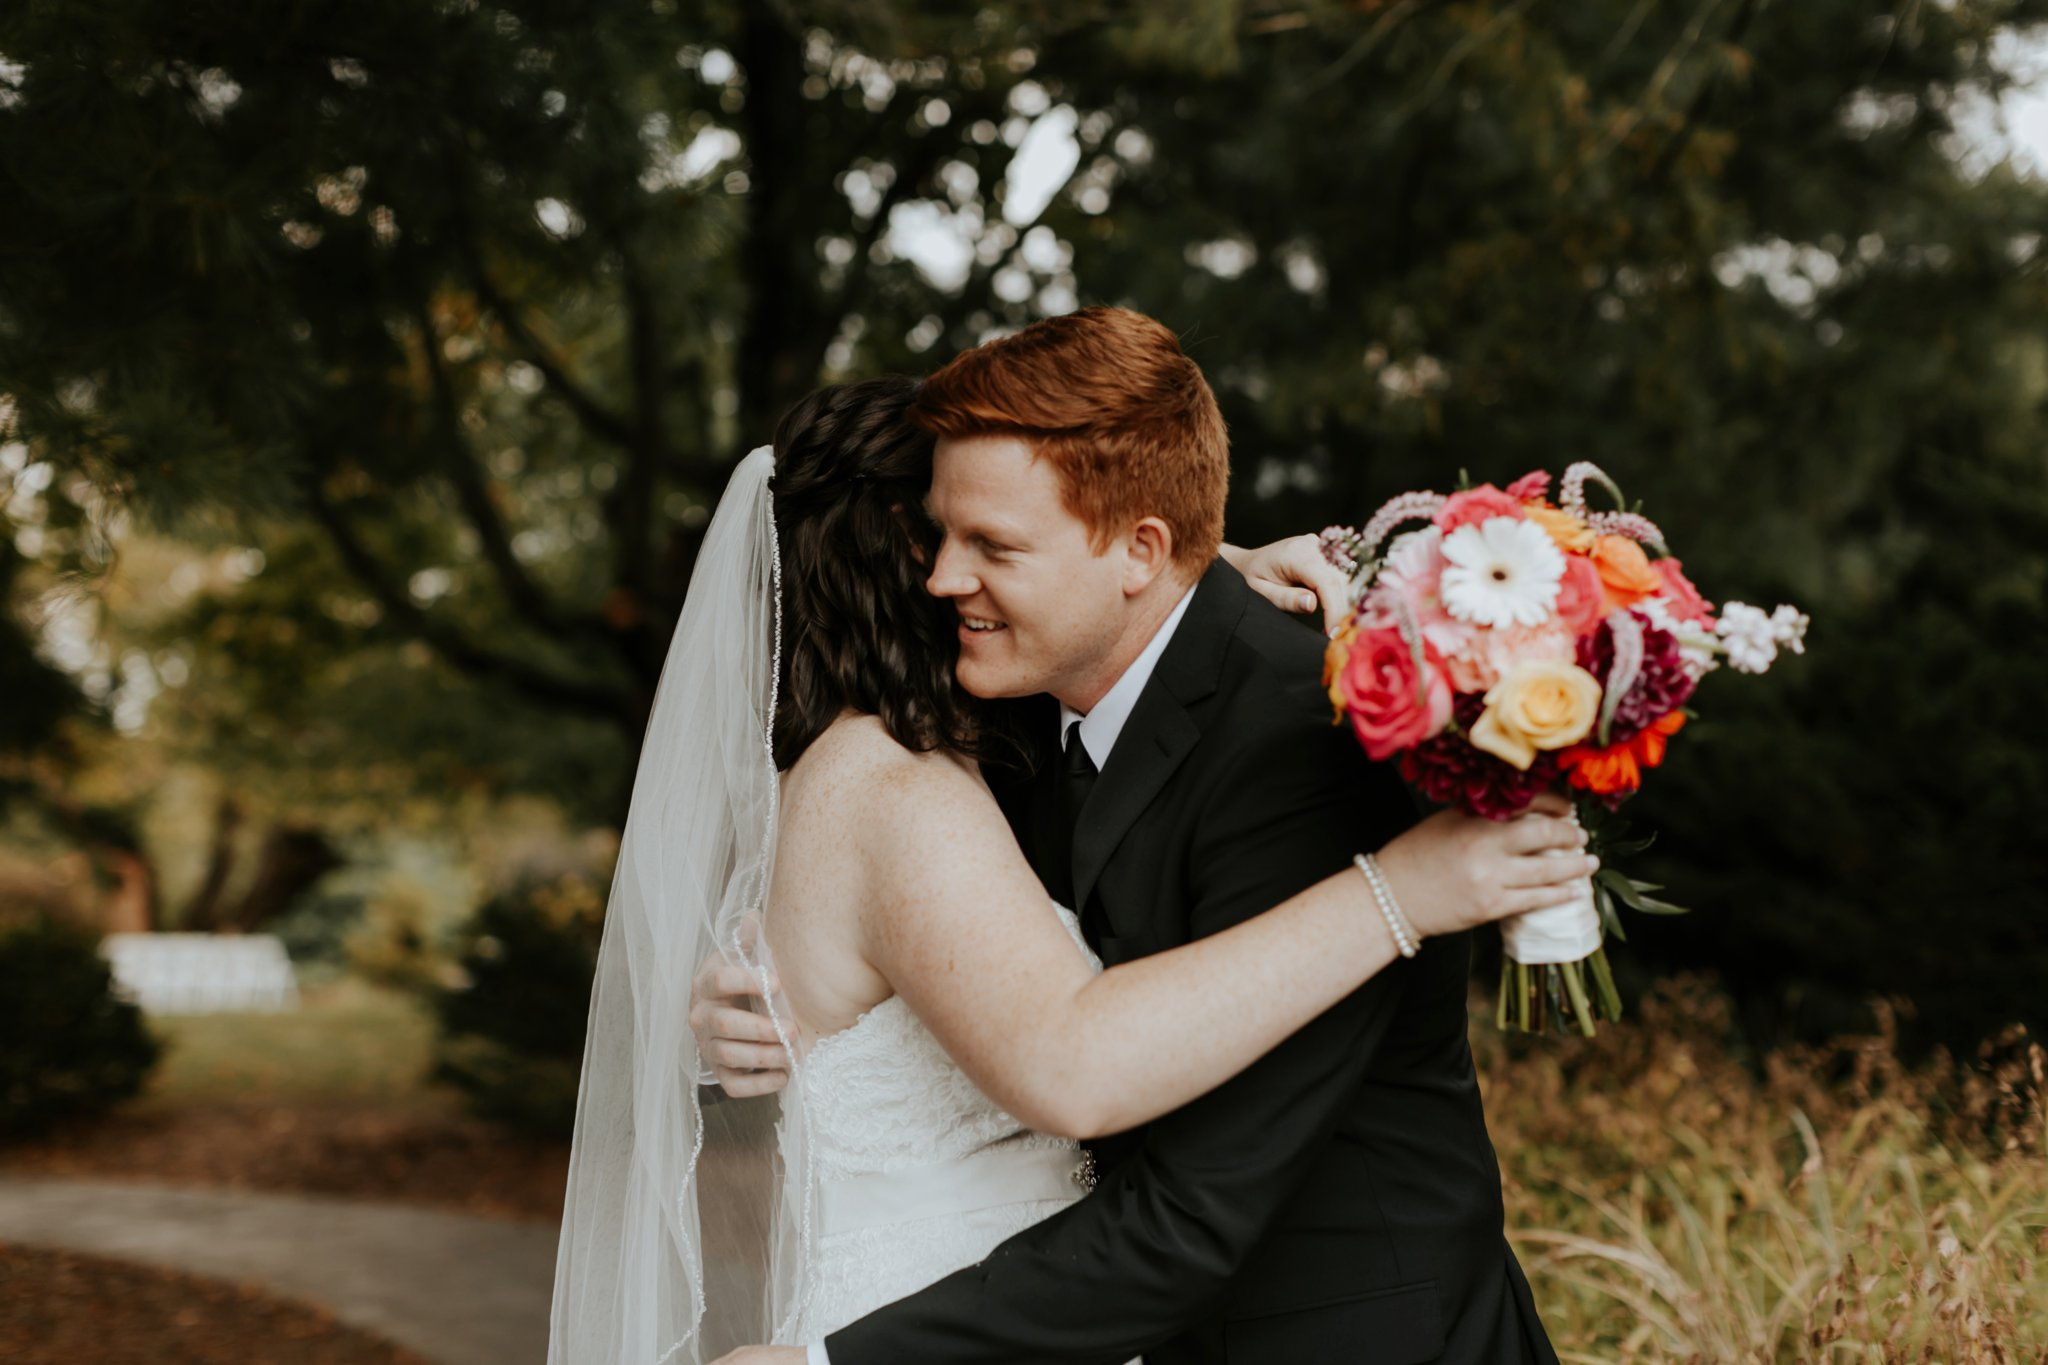 17-09-15 Lindsey and Brandon Wedding Edited-289_WEB.jpg